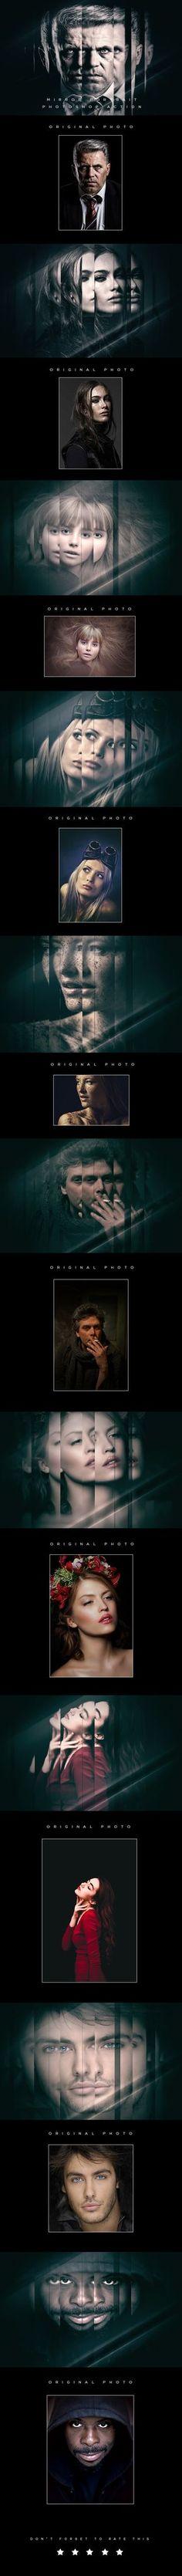 Mirror Portrait Photoshop Action - Photo Effects Actions